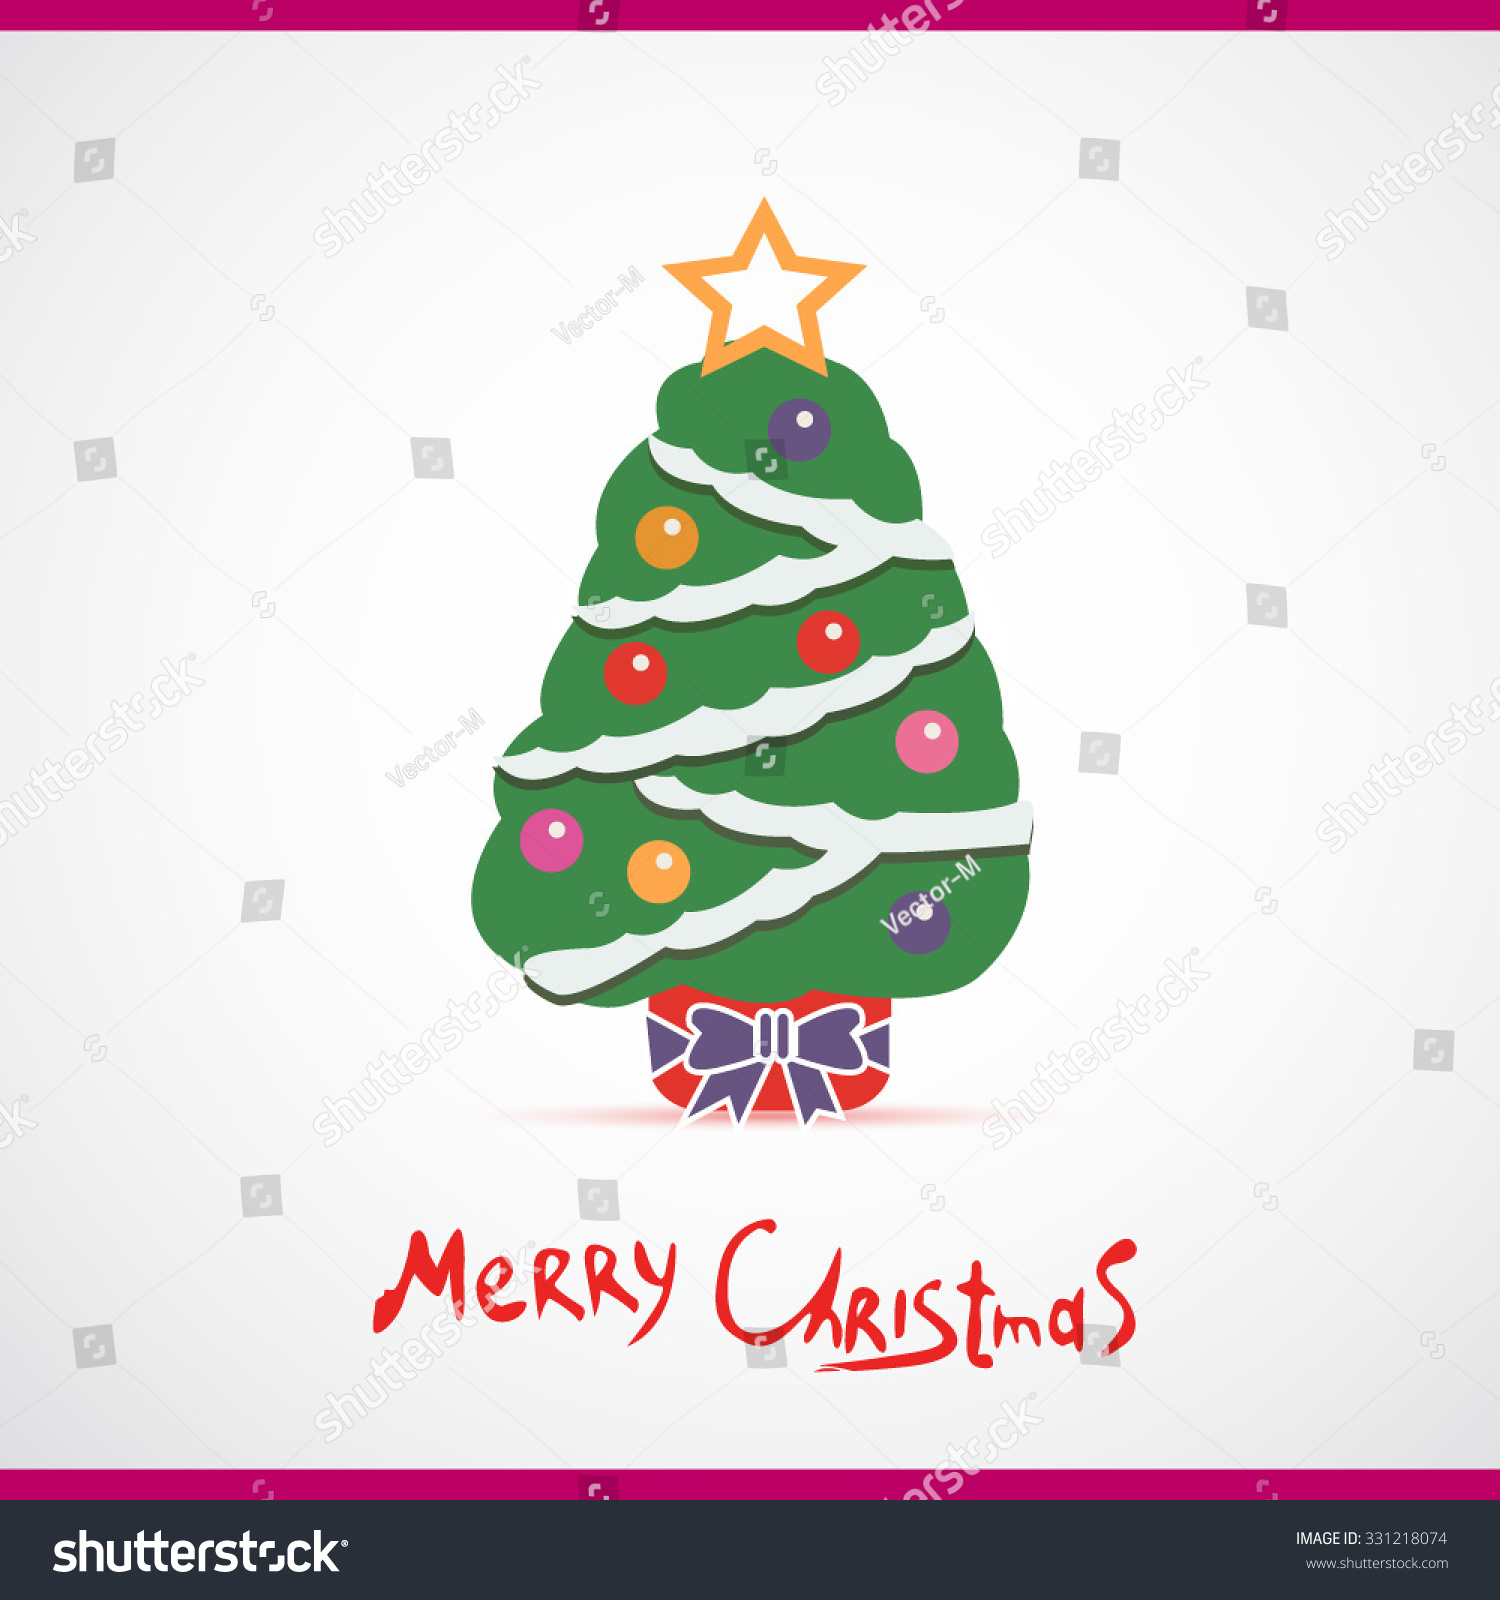 Vector Illustration Of Decorated Christmas Tree Christmas Tree